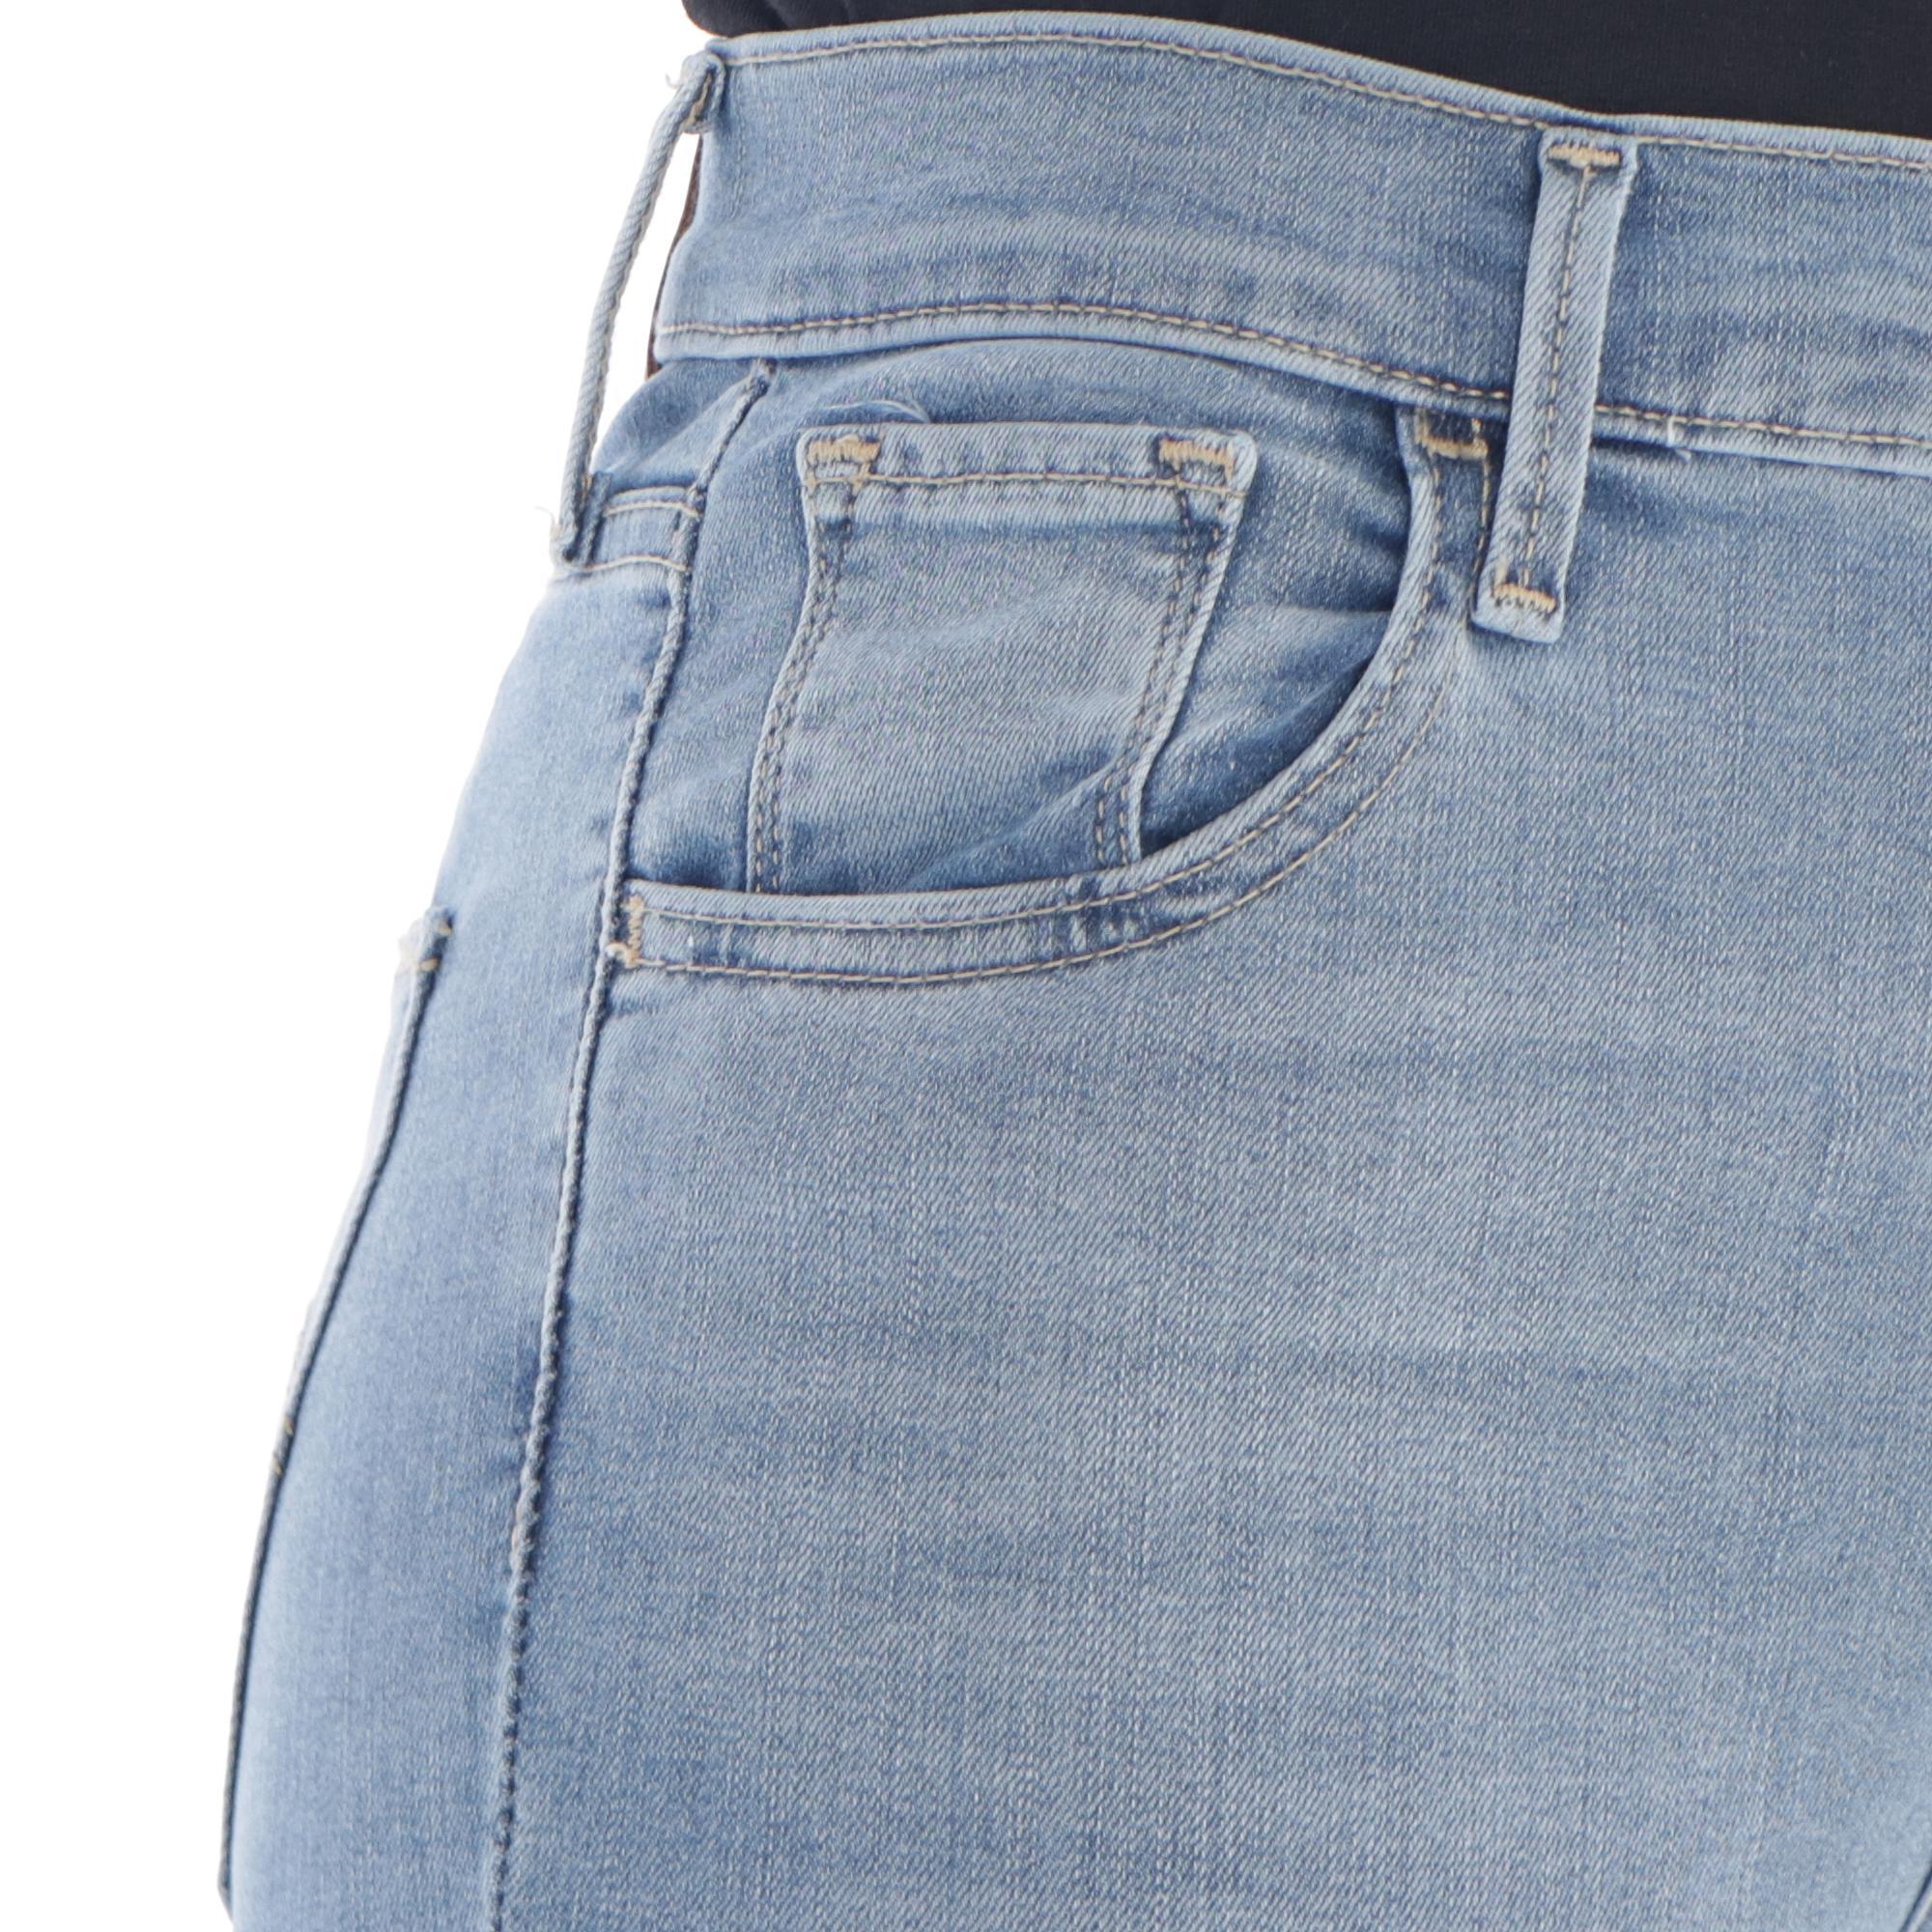 Levi's 720 High Rise Super Skinny Jeans MED INDIGO